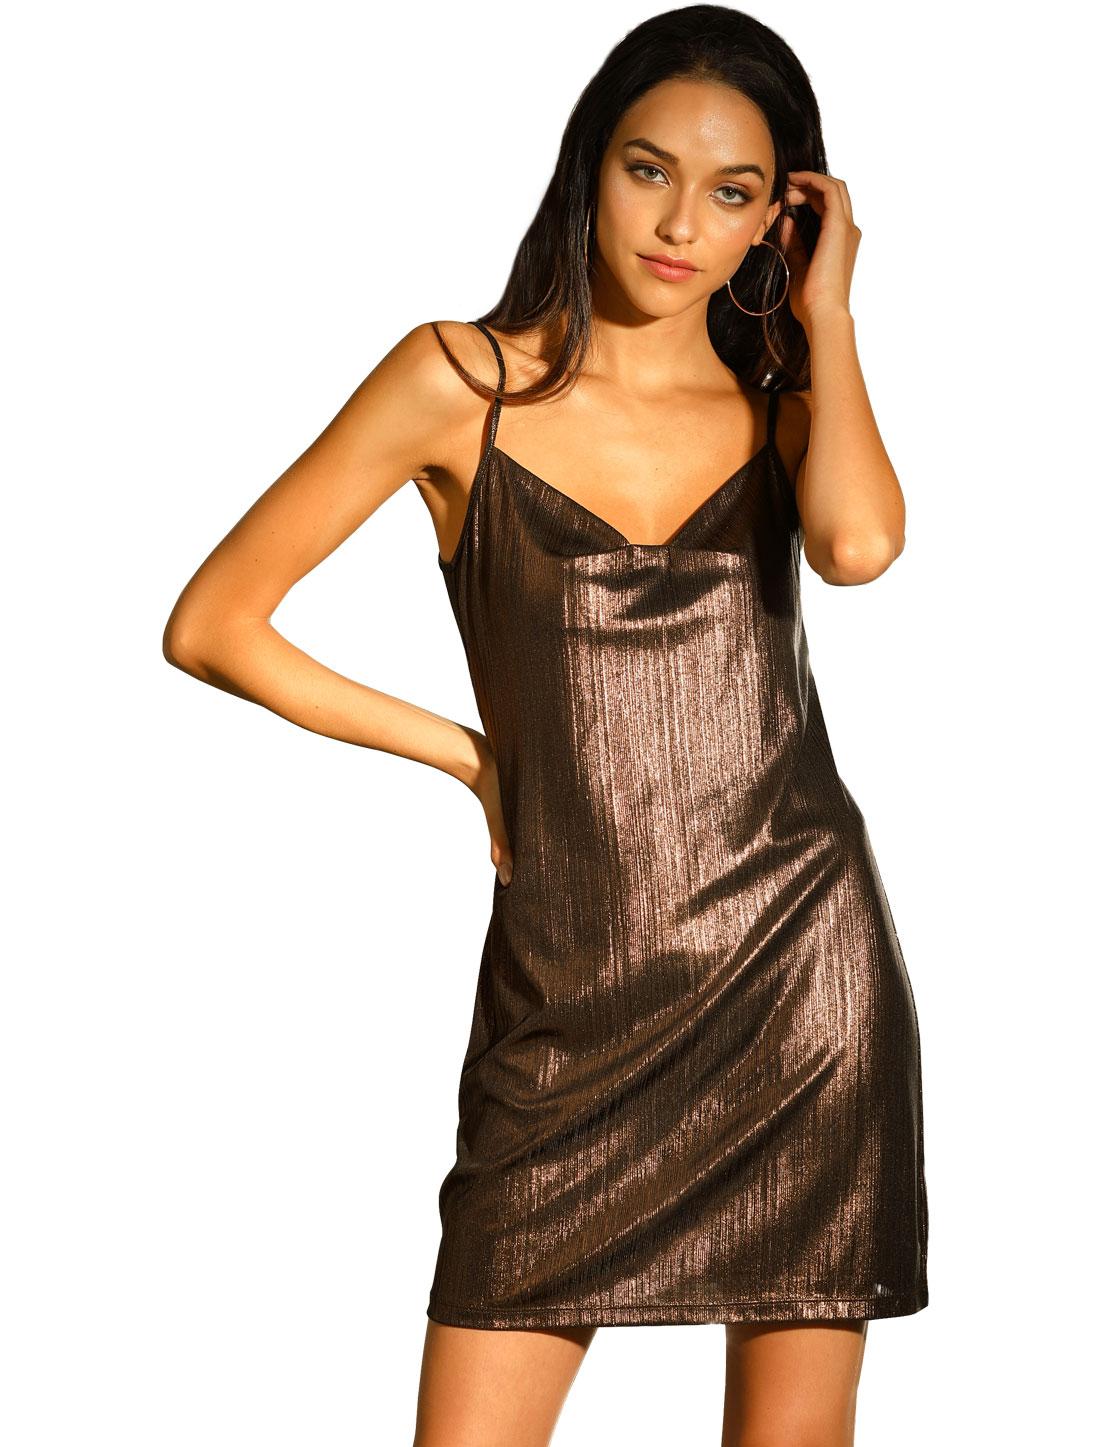 Allegra K Women's Sparkly Glitter Spaghetti Strap Party Dress Coffee Brown M